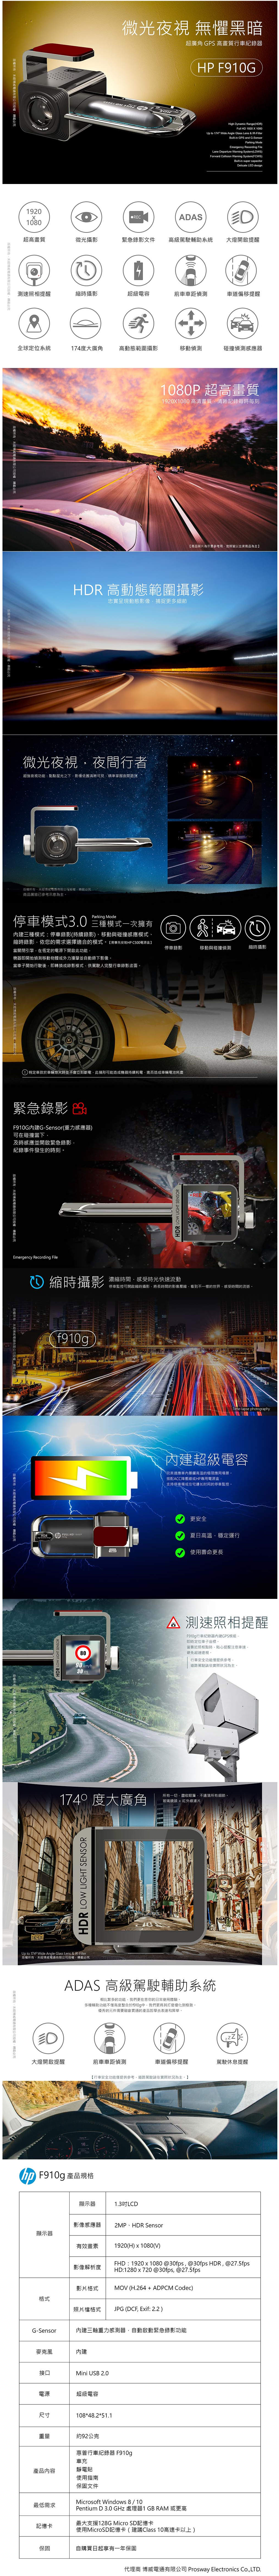 【HP 惠普】HP F910g 超廣角GPS高畫質行車紀錄器 星光夜視 HDR GPS 超廣角 -momo購物網